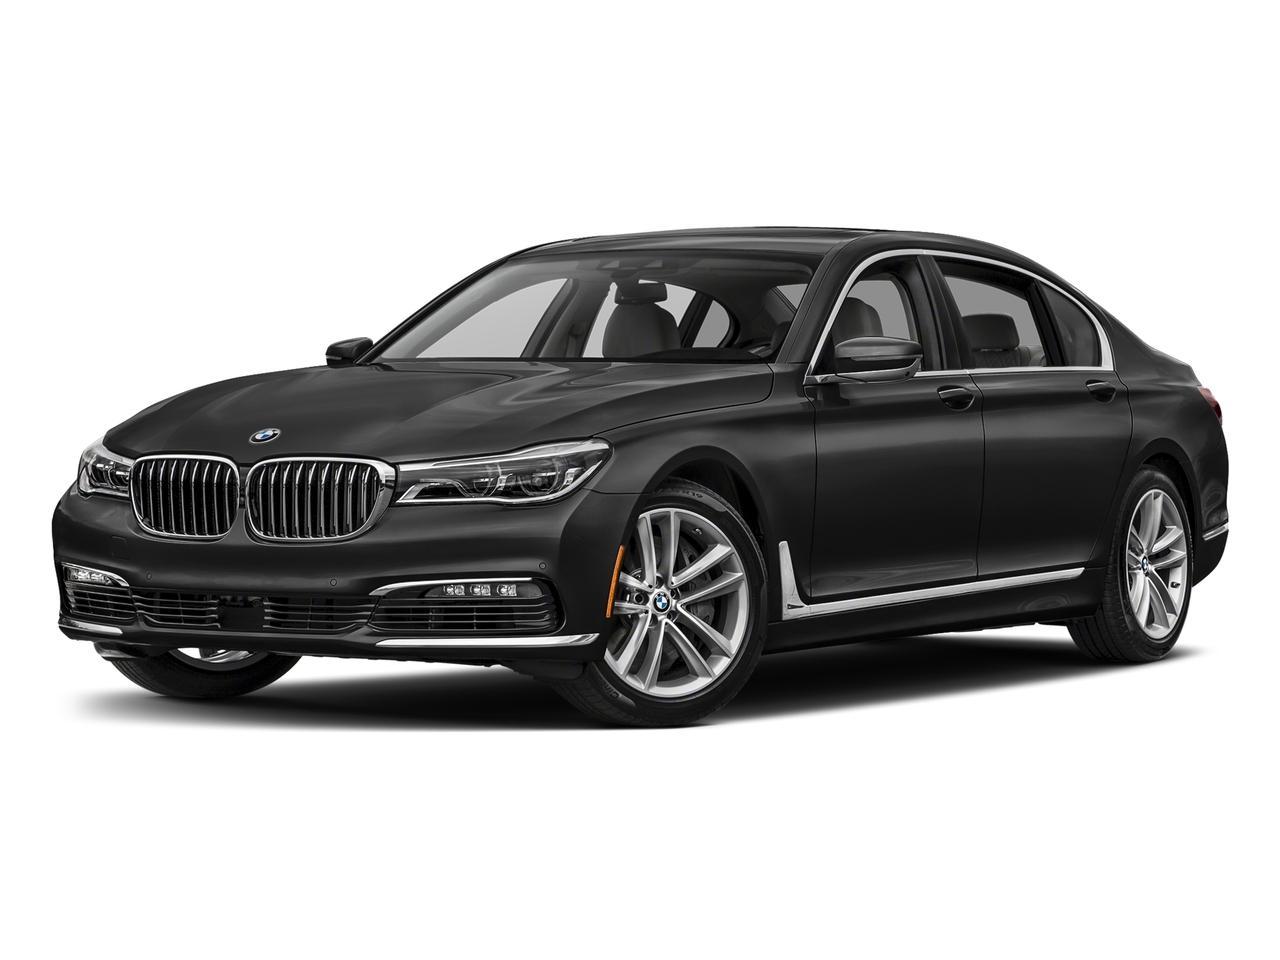 2018 BMW 750i Vehicle Photo in Charleston, SC 29407